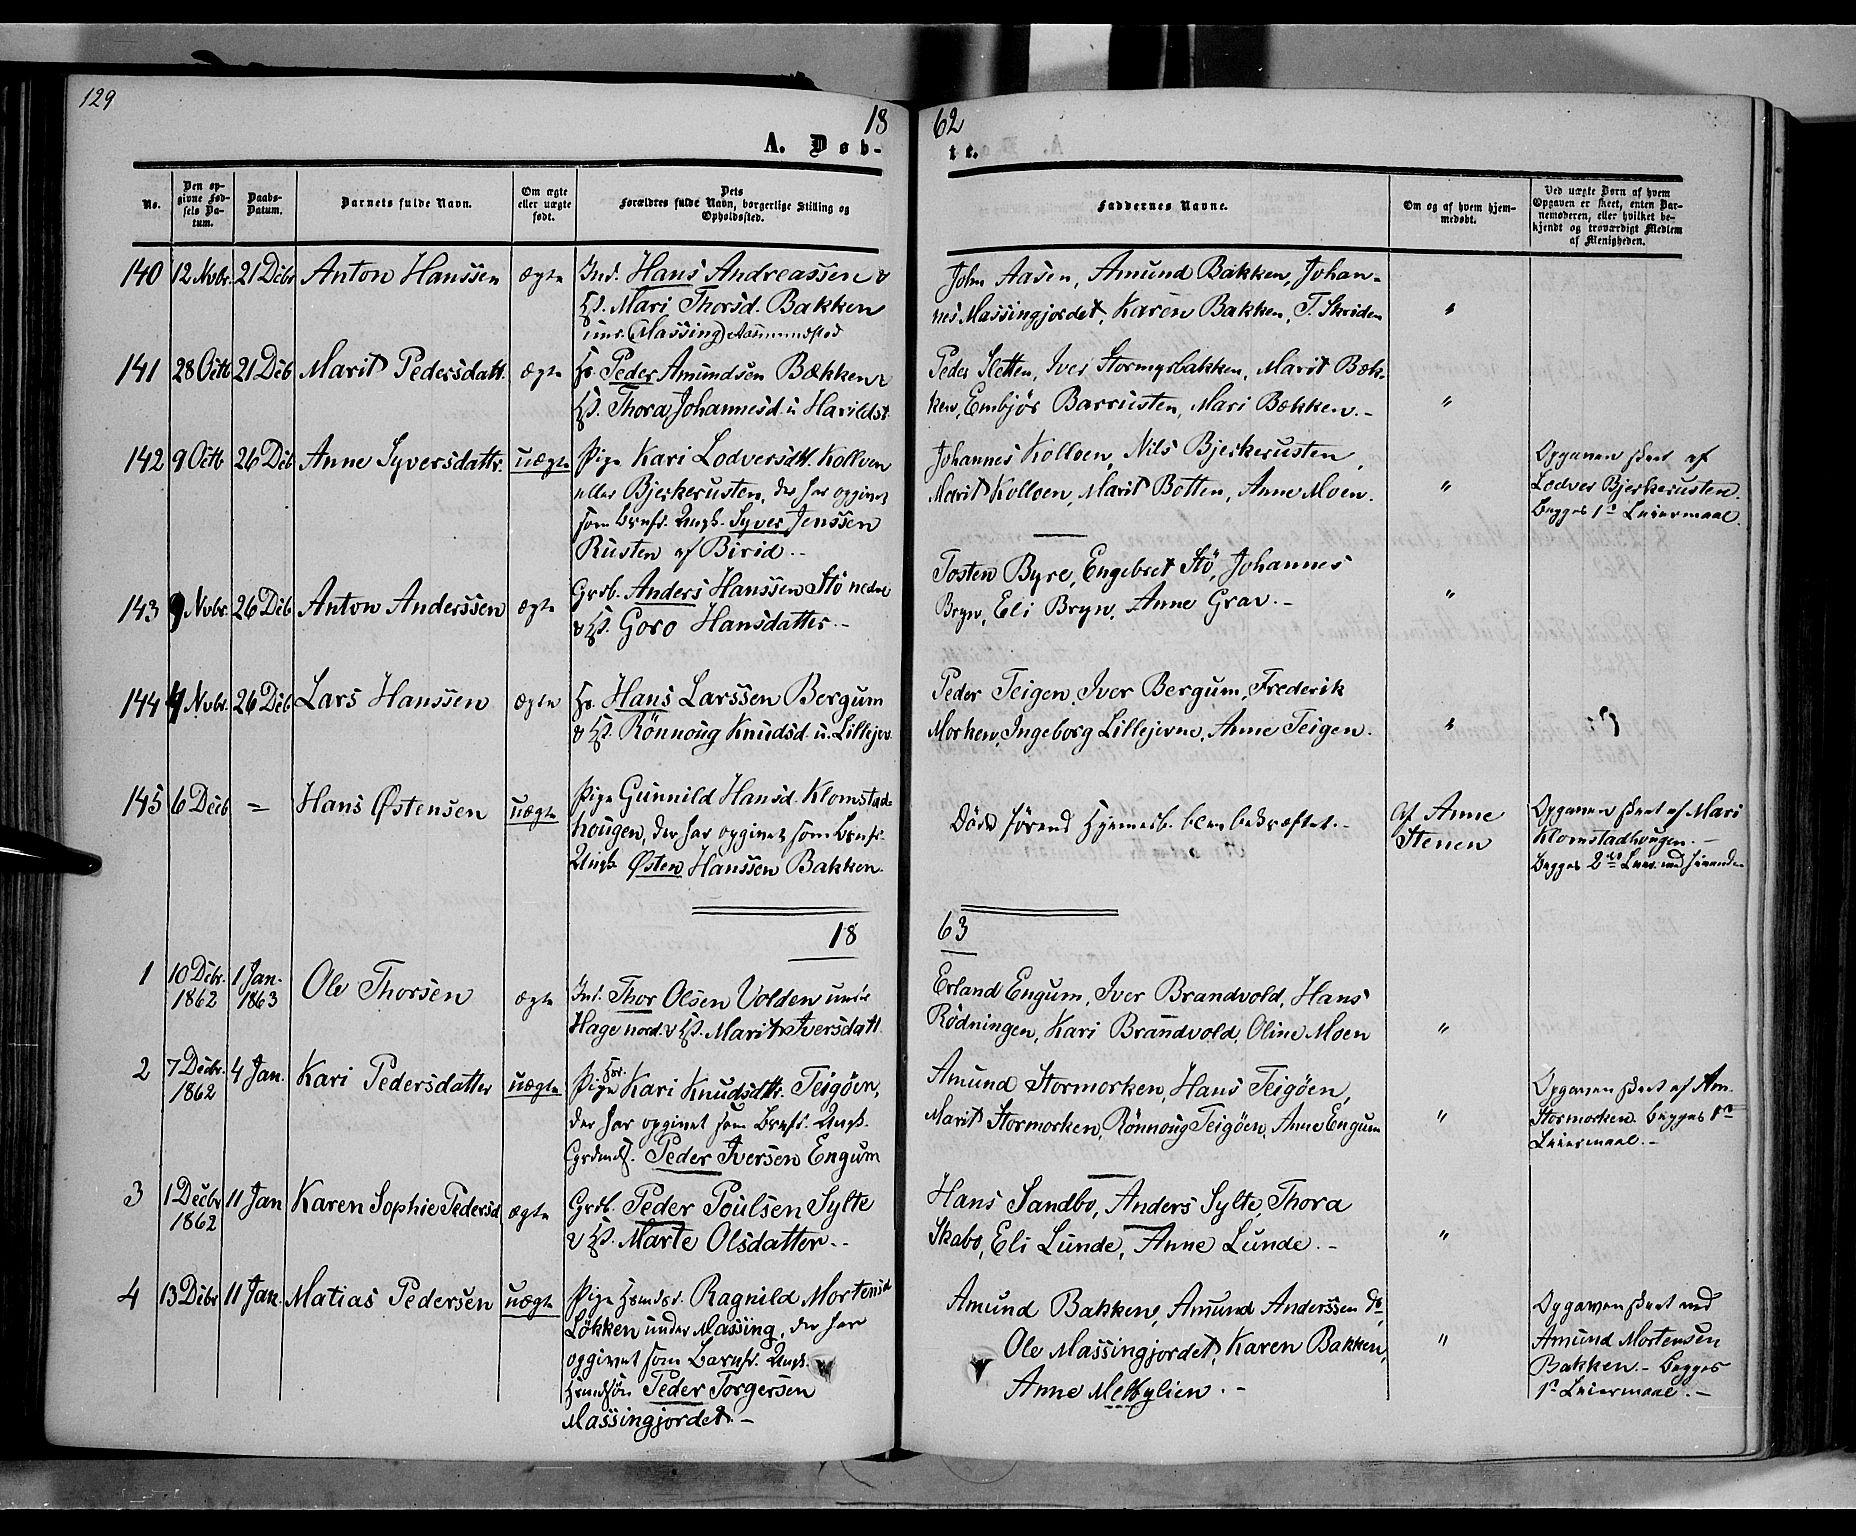 SAH, Nord-Fron prestekontor, Ministerialbok nr. 1, 1851-1864, s. 129